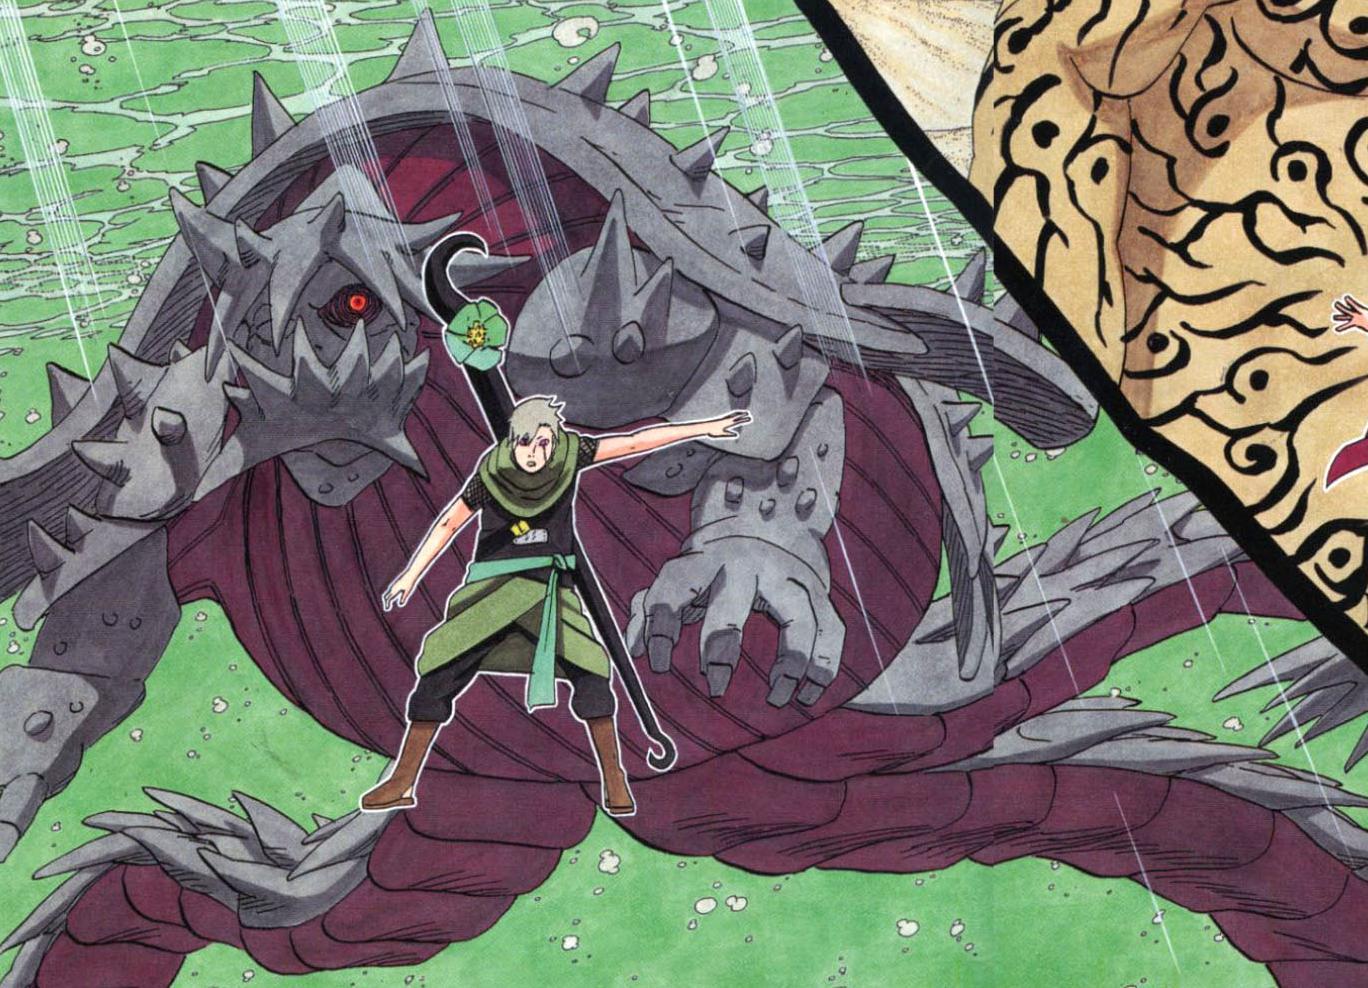 Isobu | Naruto Profile Wiki | FANDOM powered by Wikia